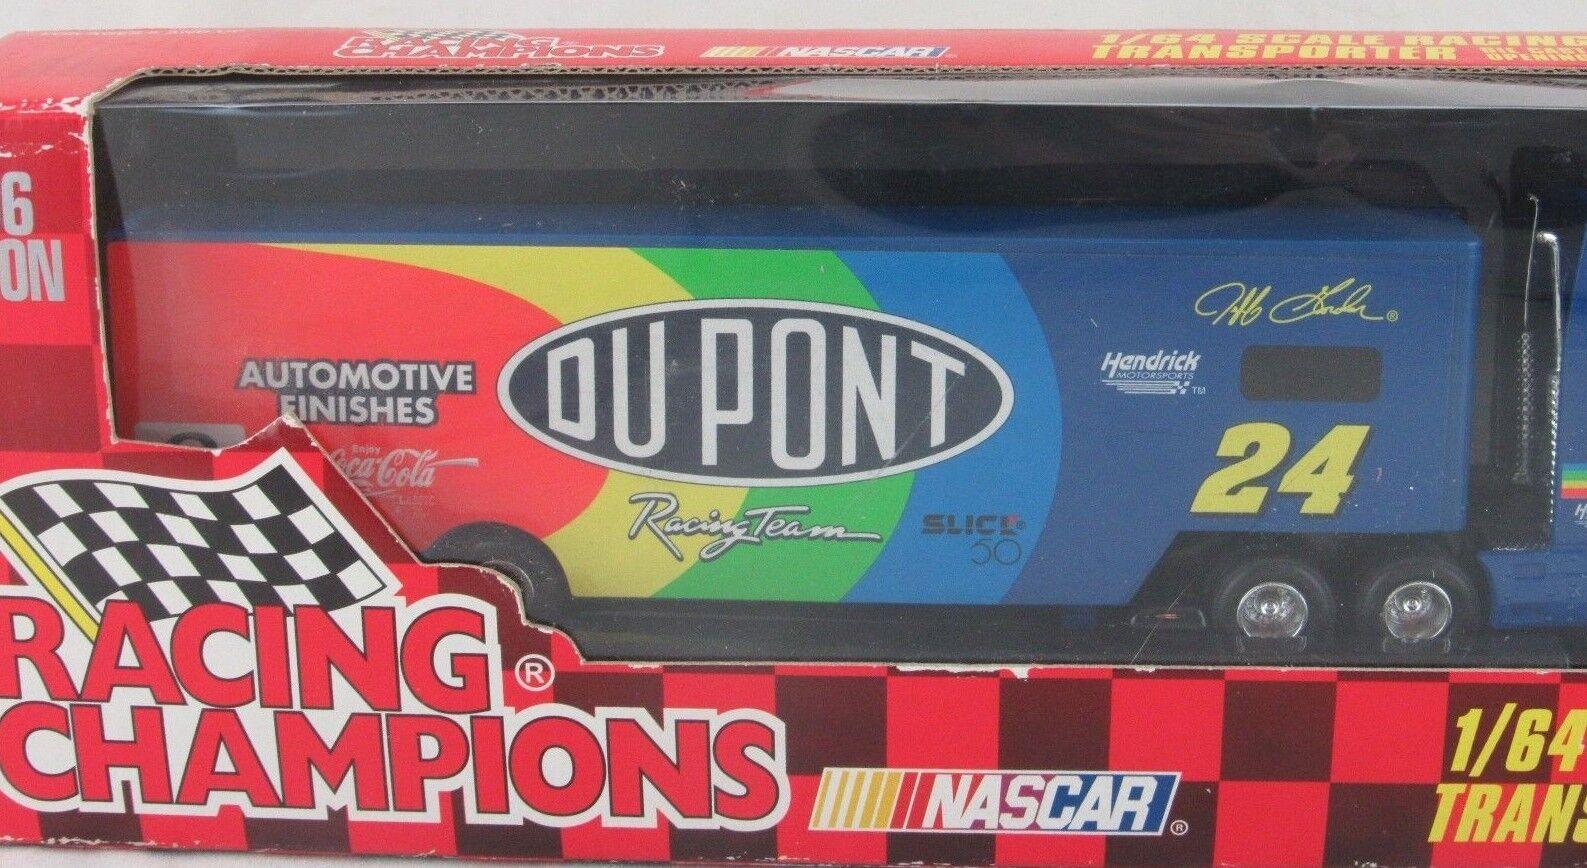 Jeff Gordon Racing Champions 1996 1:64 Scale Racing Team Team Team Transporter 02a121